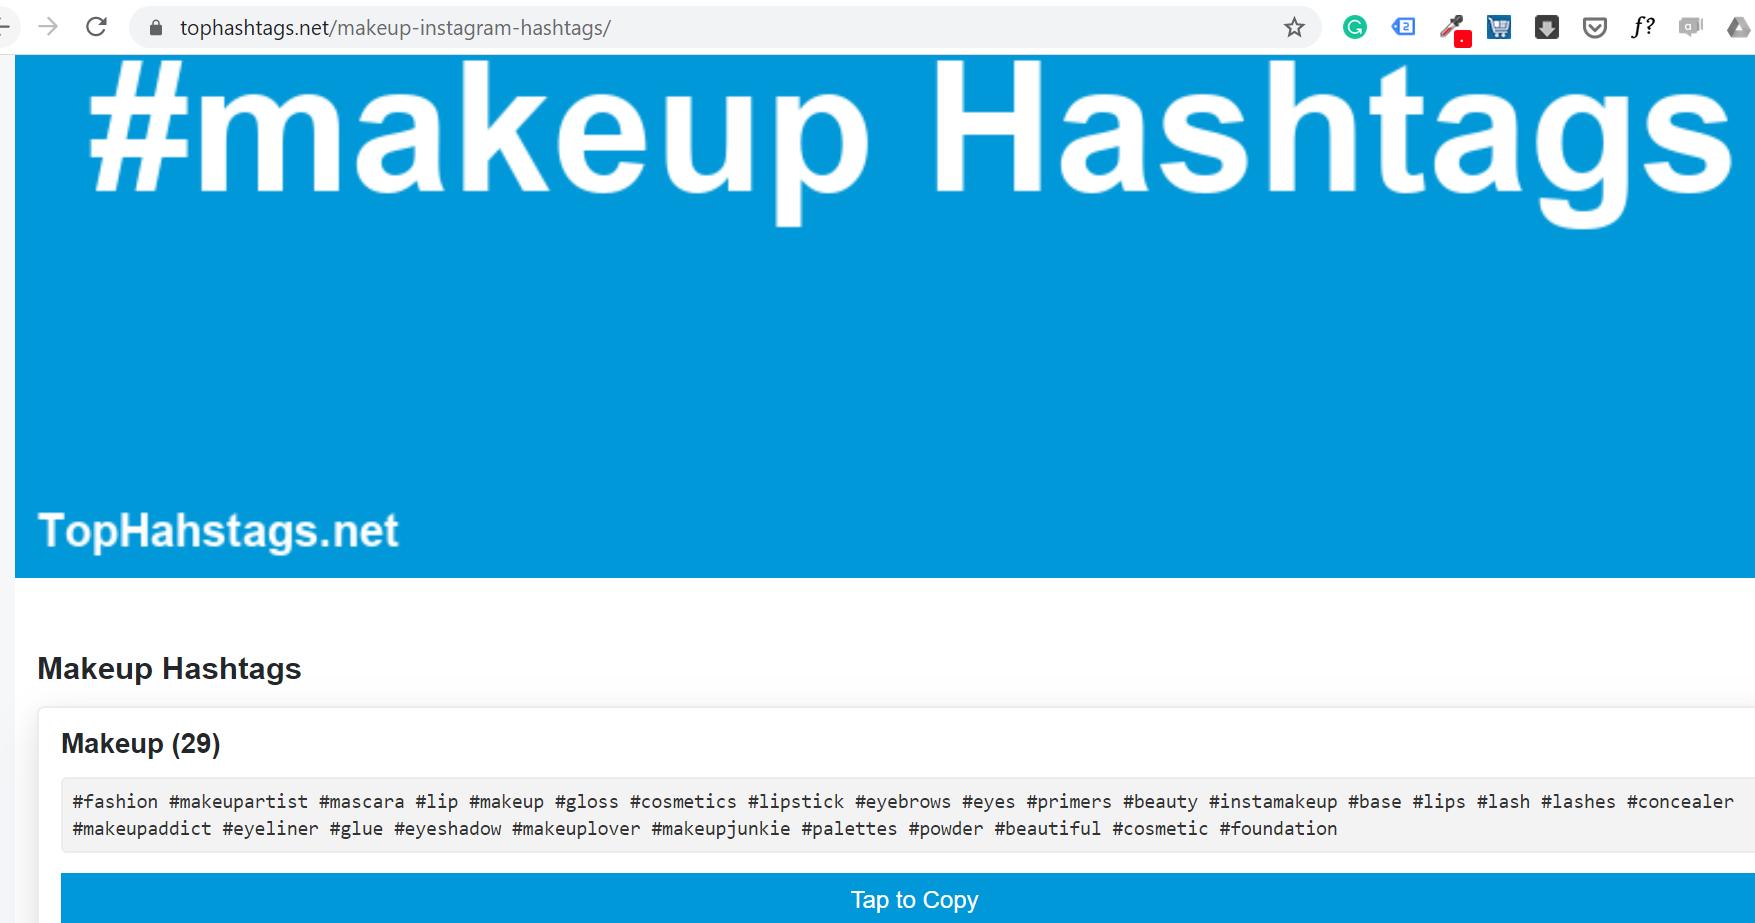 tophashtags